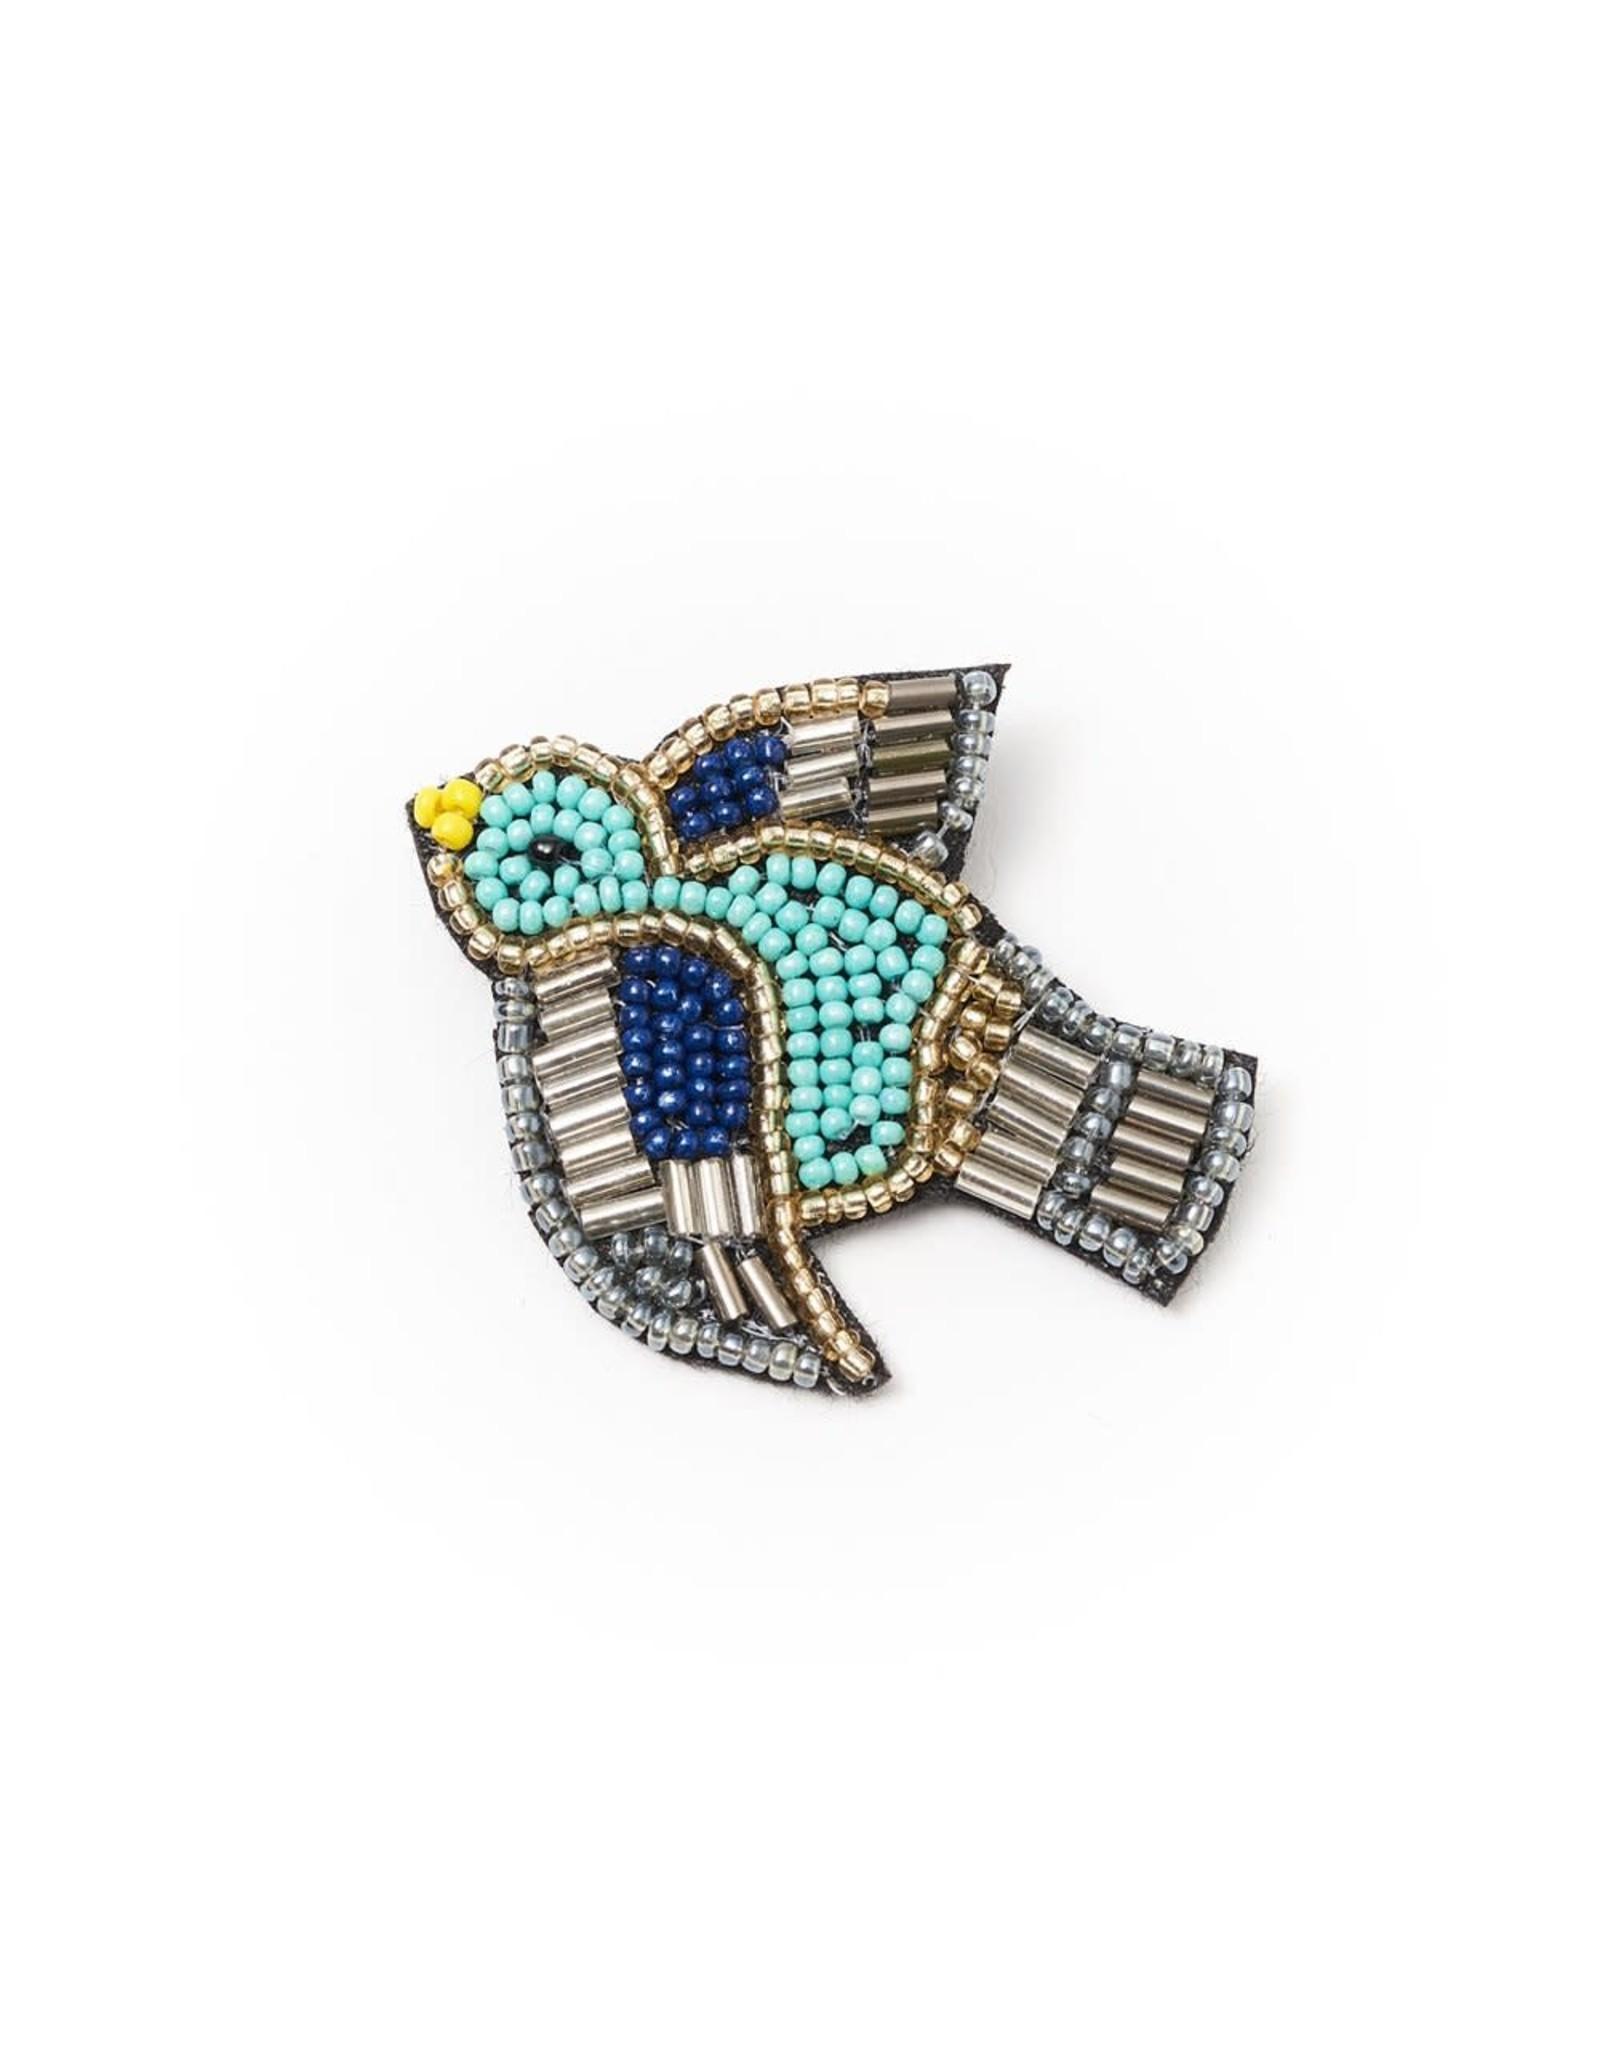 Matr Boomie Bala Mani Bird Brooch, India